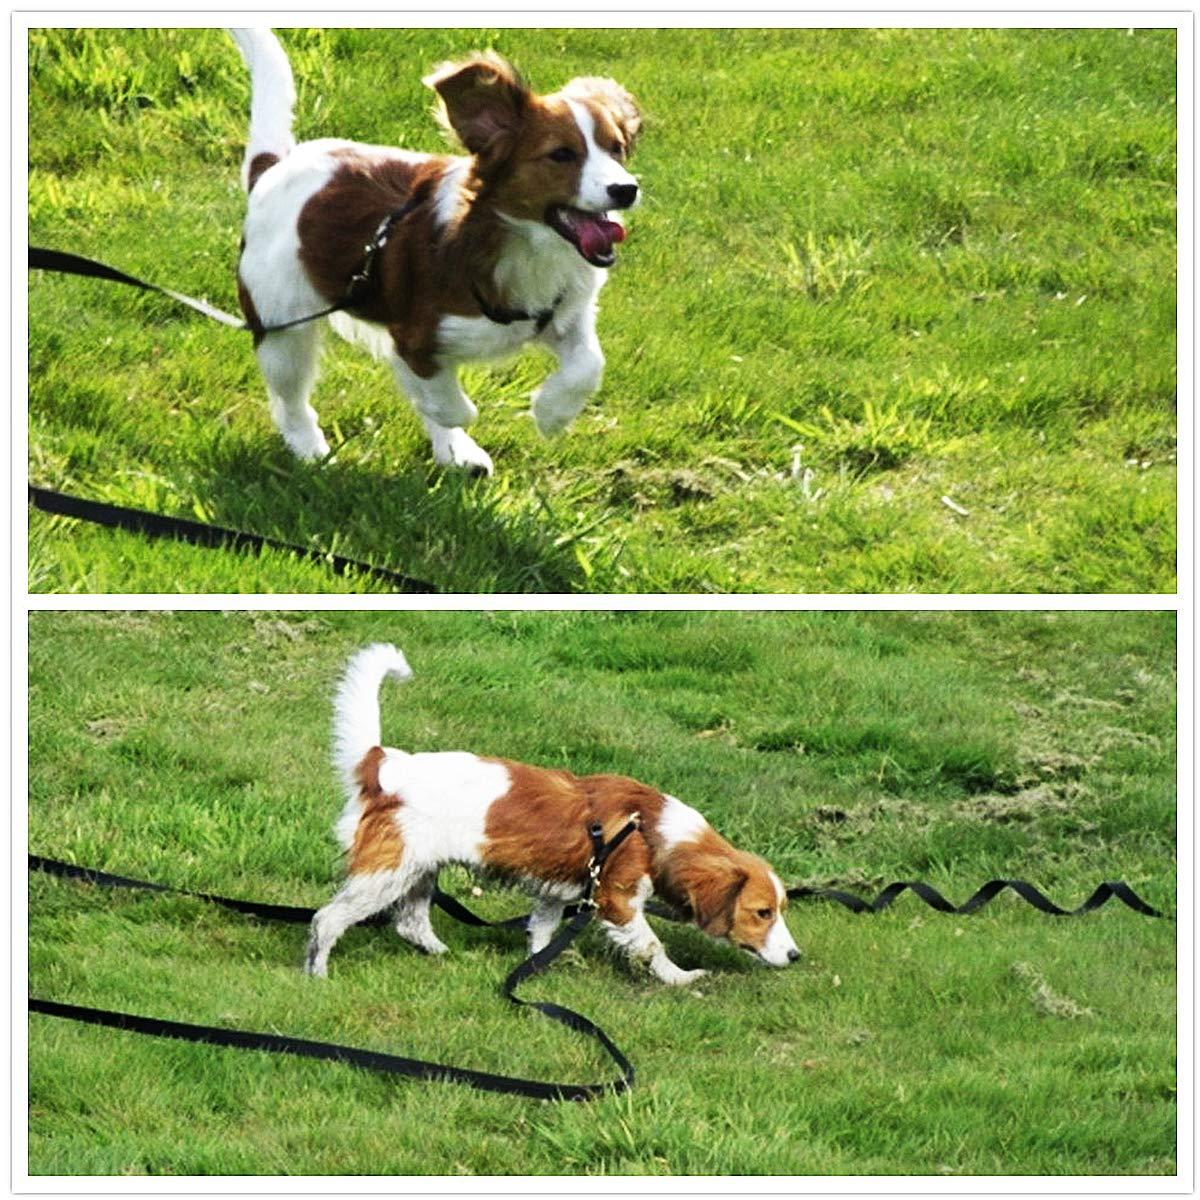 Musonic 50ft 65ft 100ft Black Extra Long Line Training Dog Leash (50 Feet)